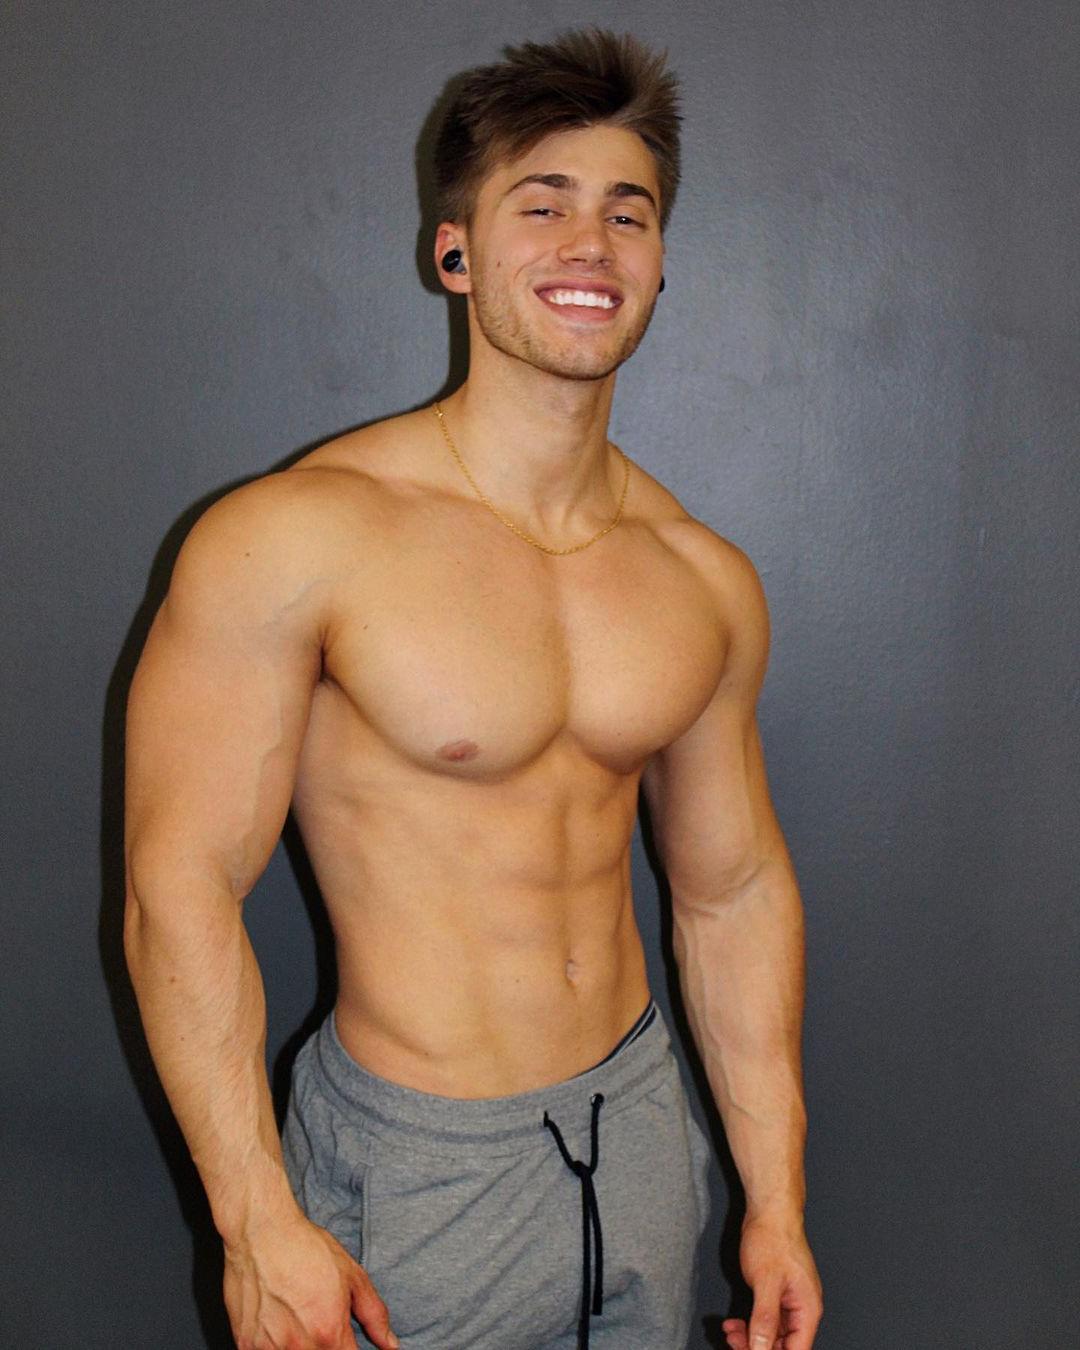 shirtless-cute-boys-muscular-body-aaron-miller-smiling